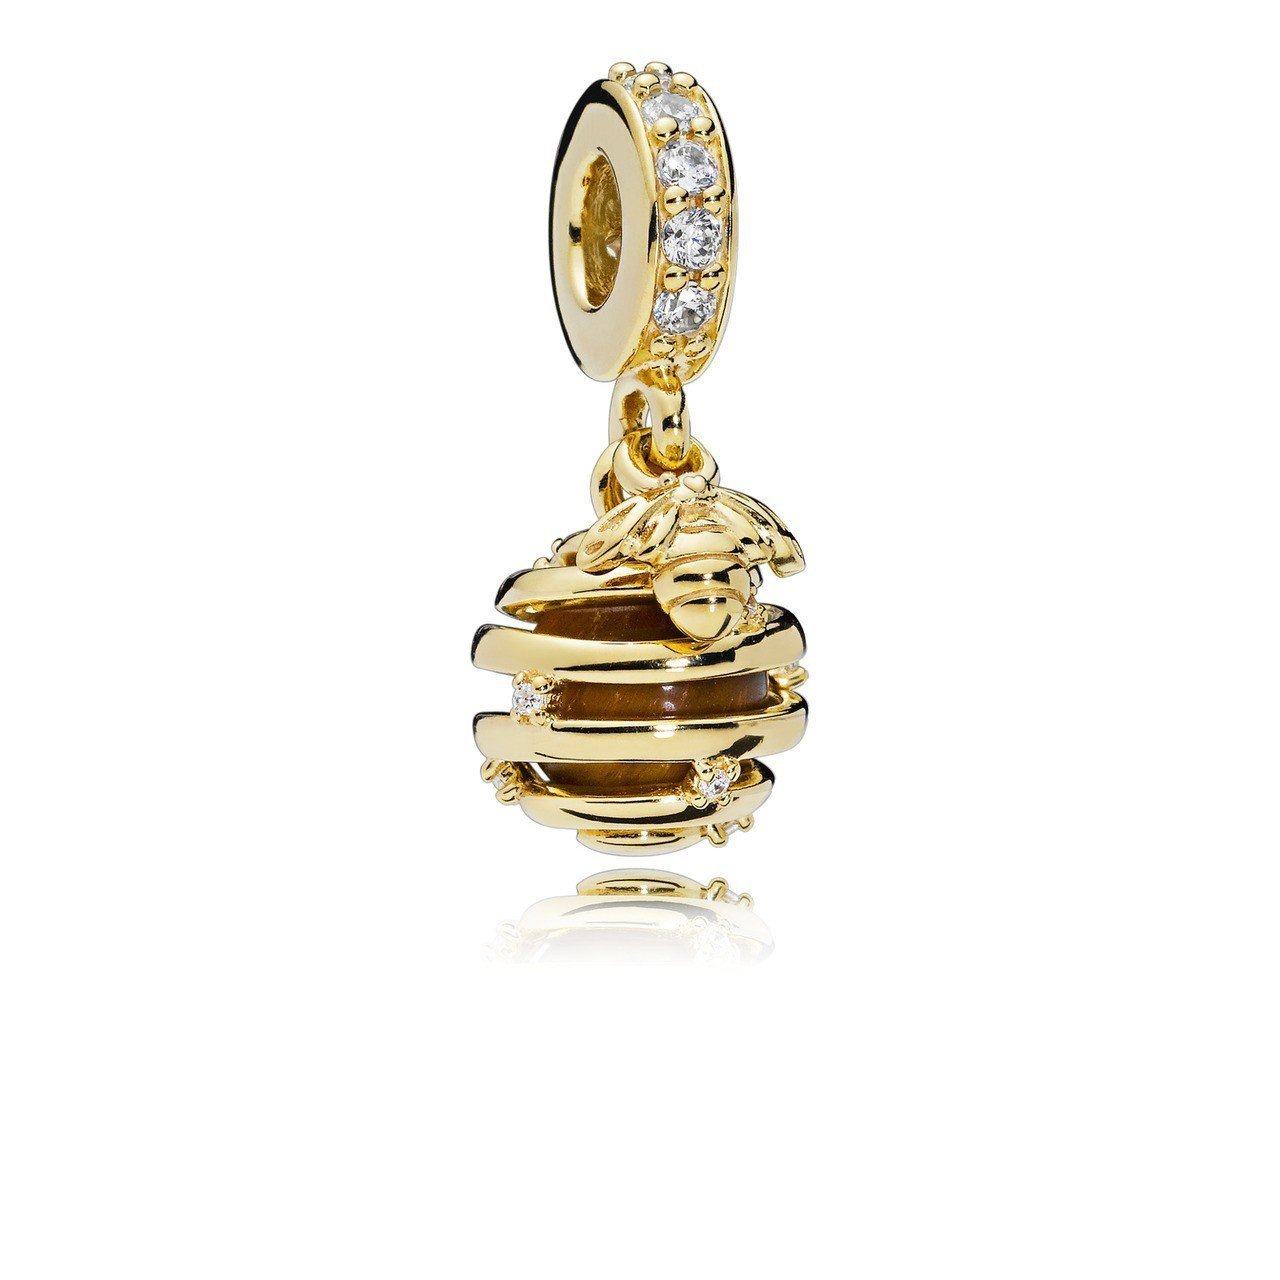 PANDORA SHINE甜蜜蜂窩鋯石吊飾 3,880元。圖/PANDORA提供